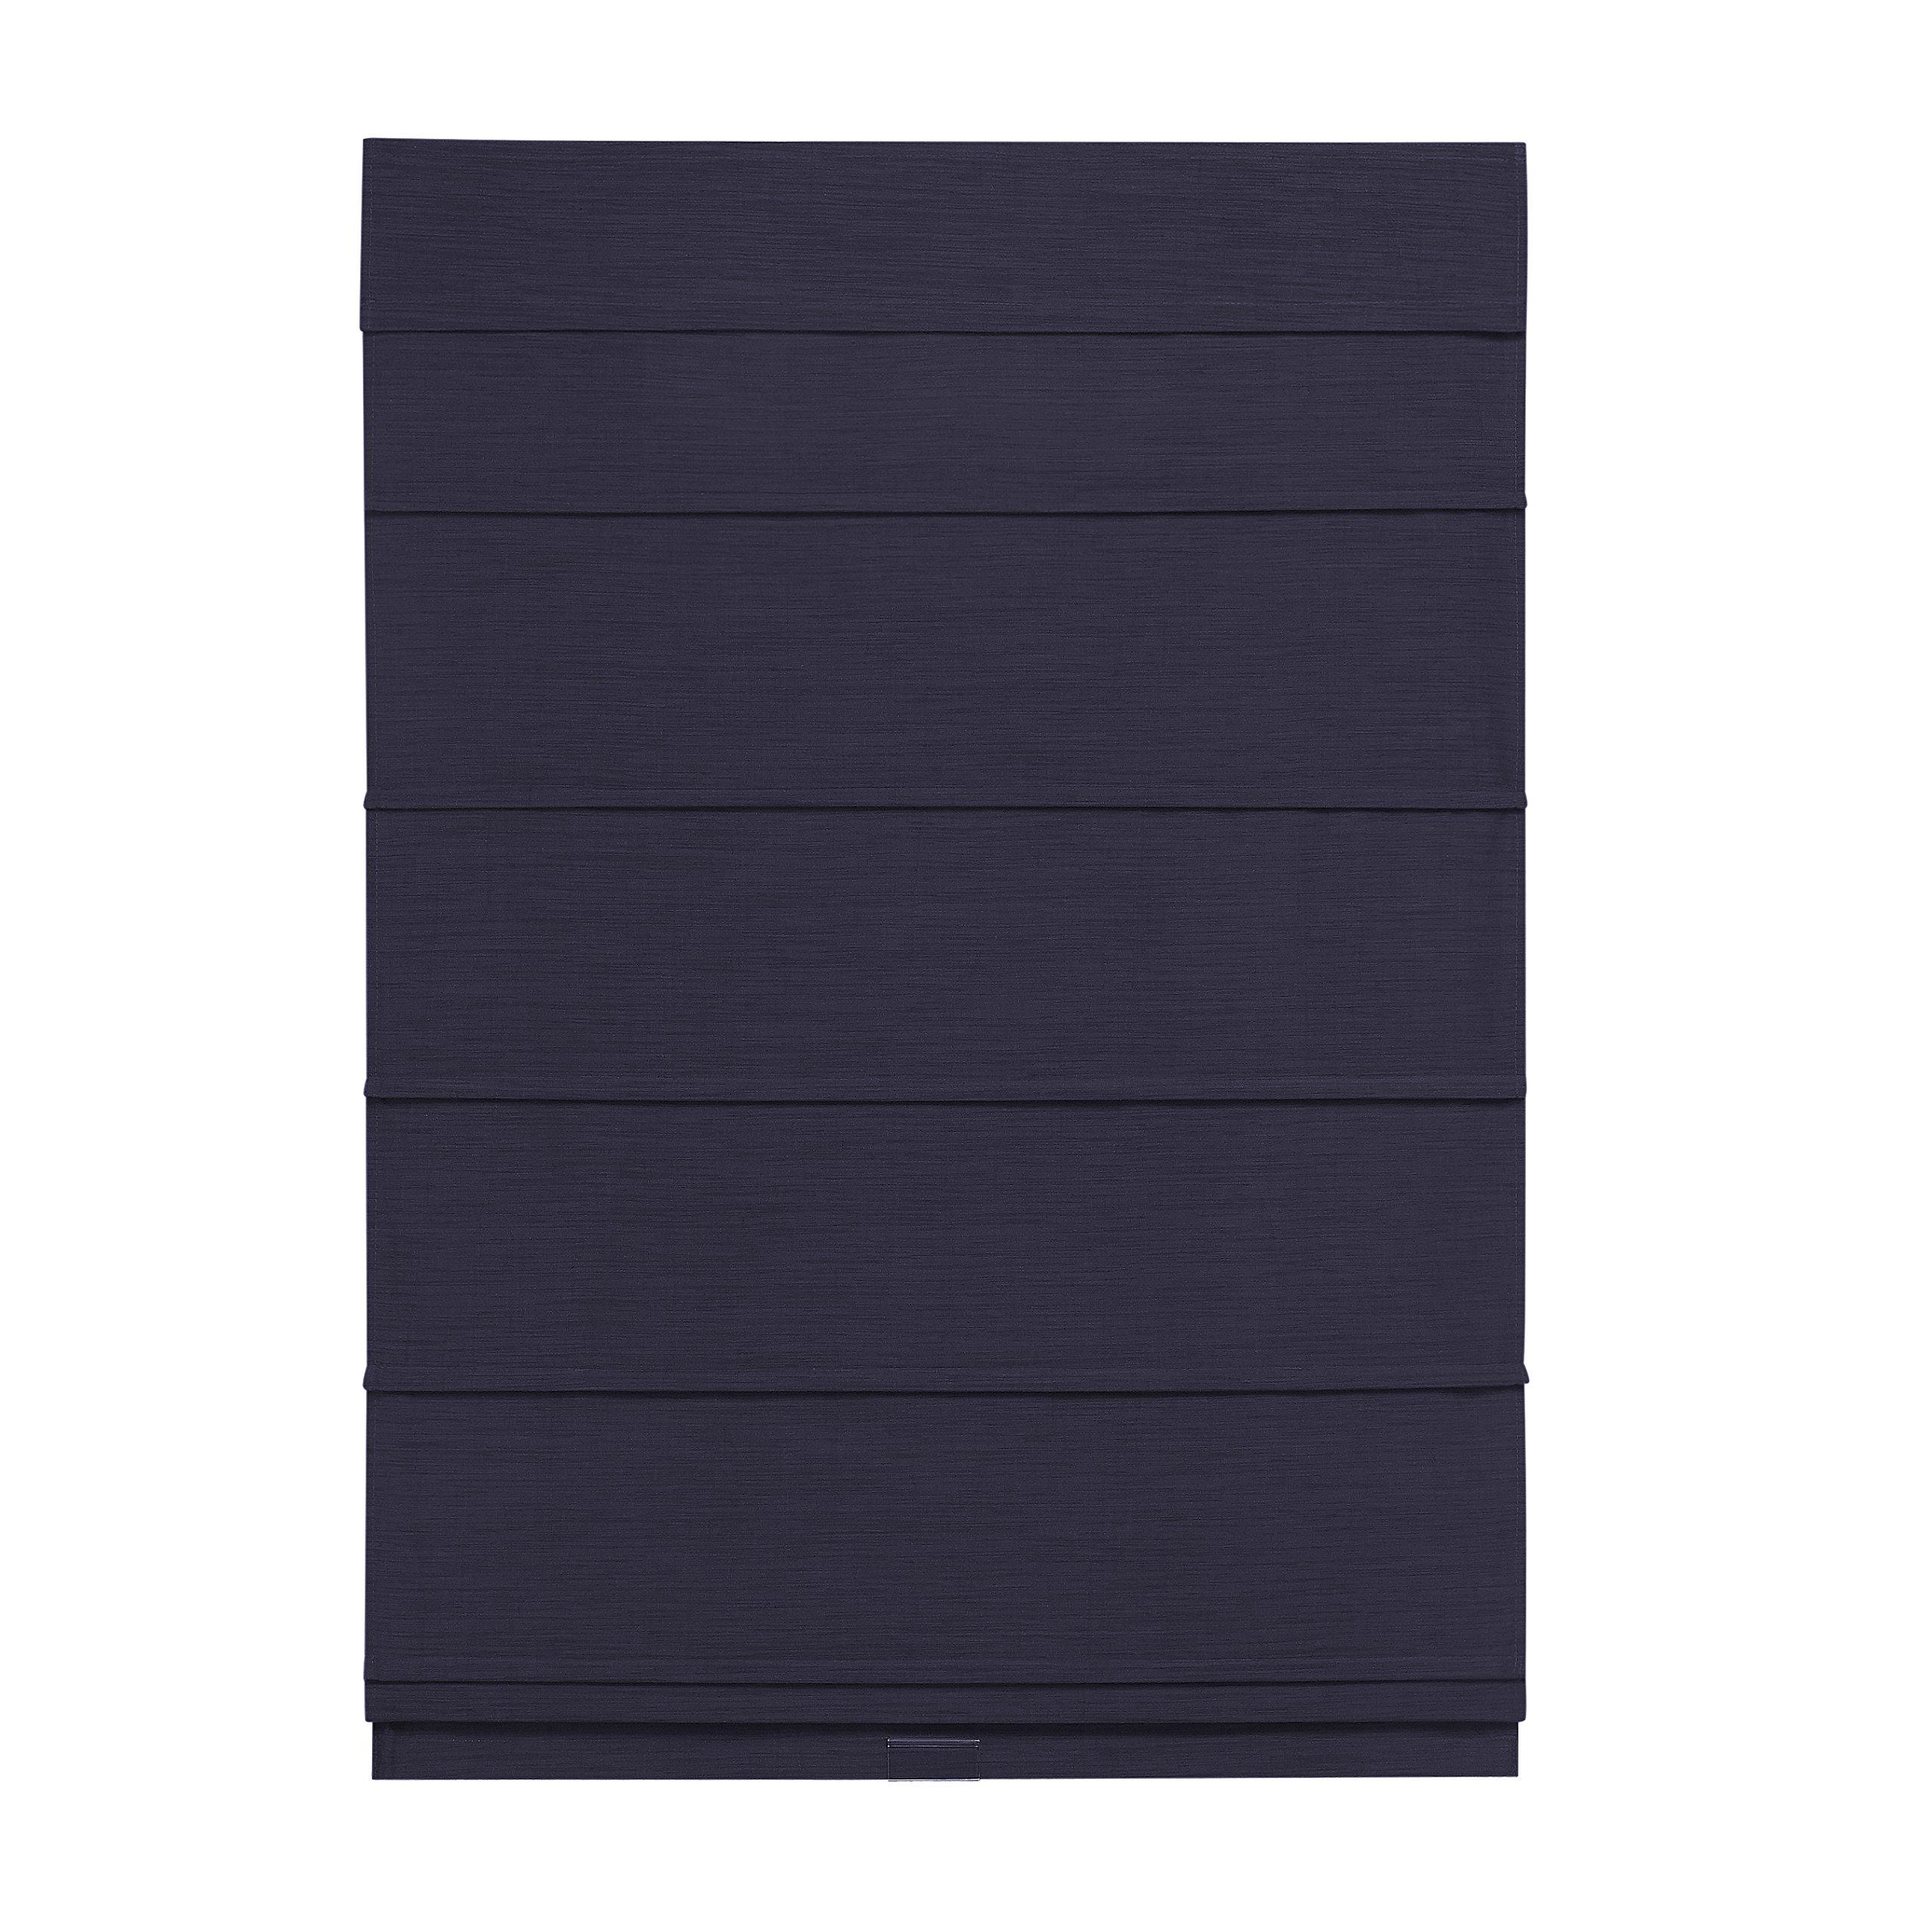 Cordless Room Darkening Fabric Roman Shade (Navy, 31x64) by The Shade & Shutter Factory